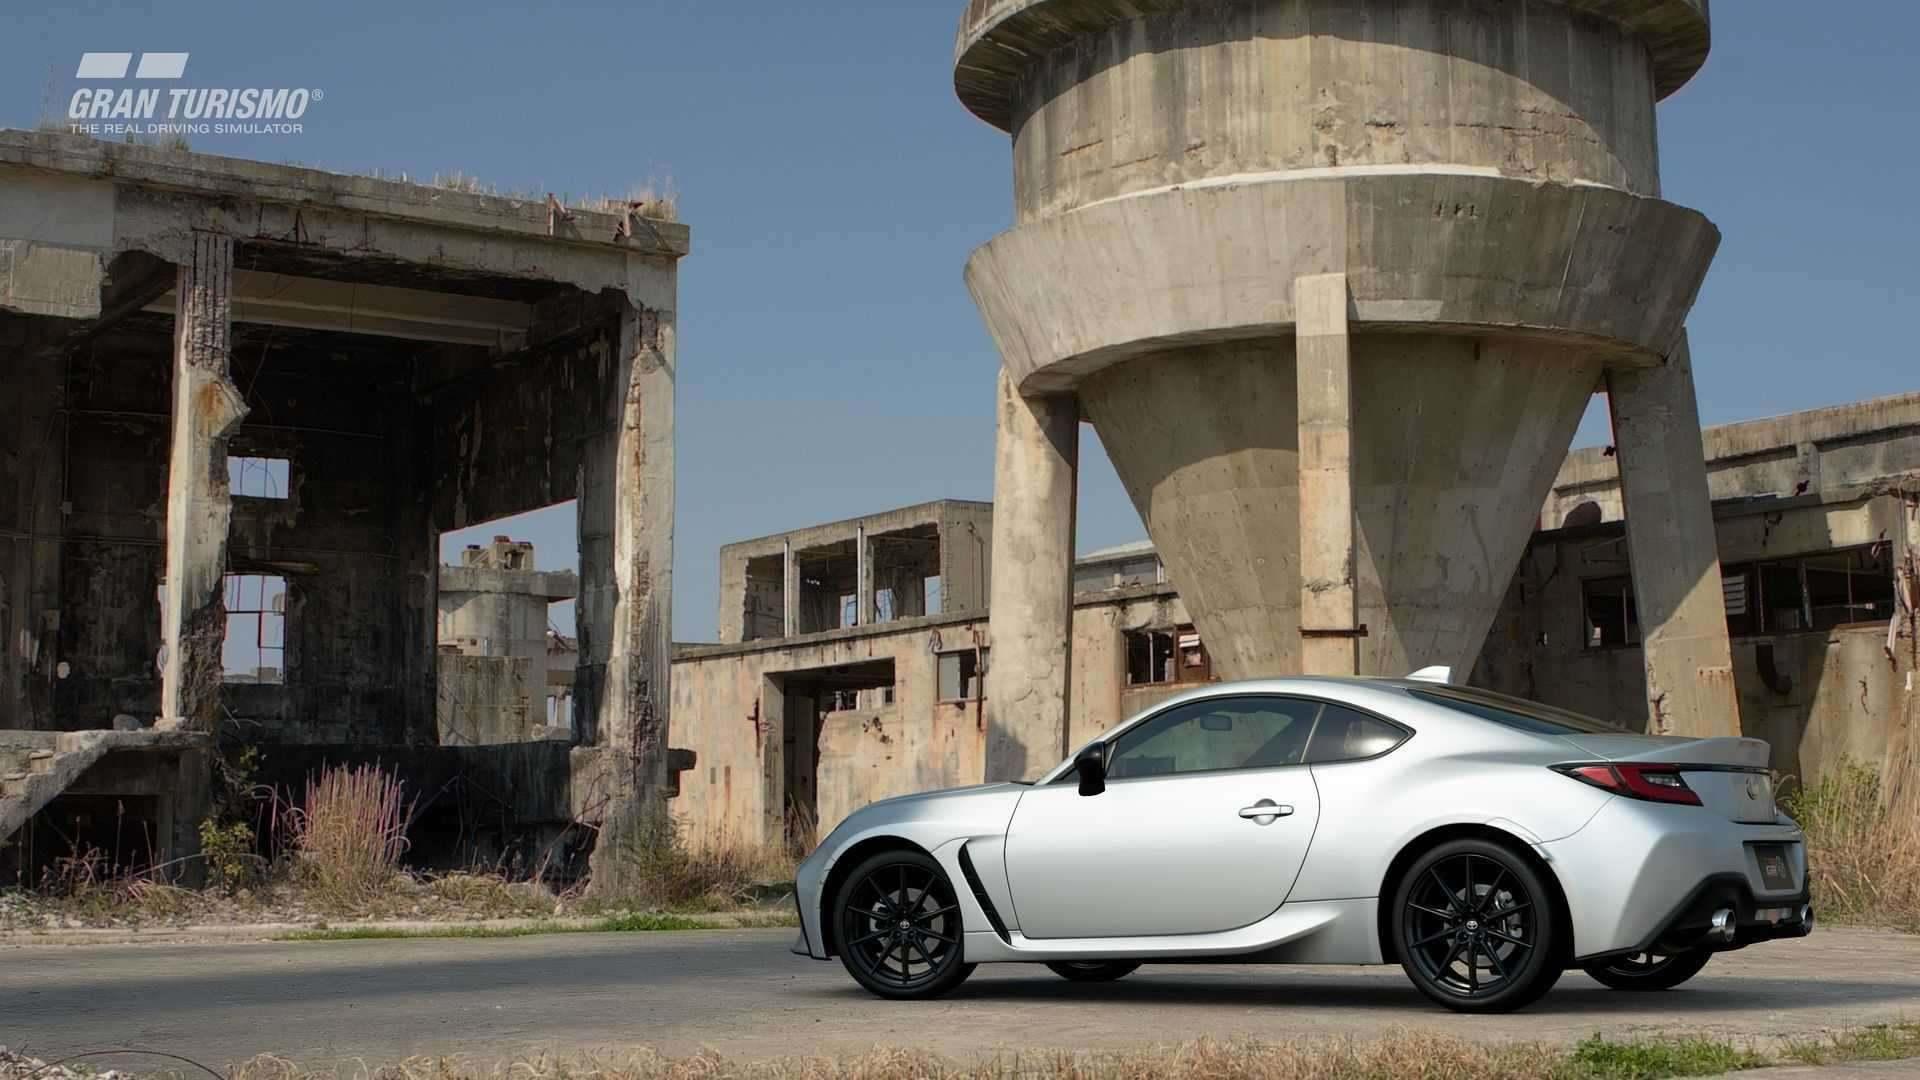 2022_Toyota_GR_86_Gran_Turismo-Sport-0001